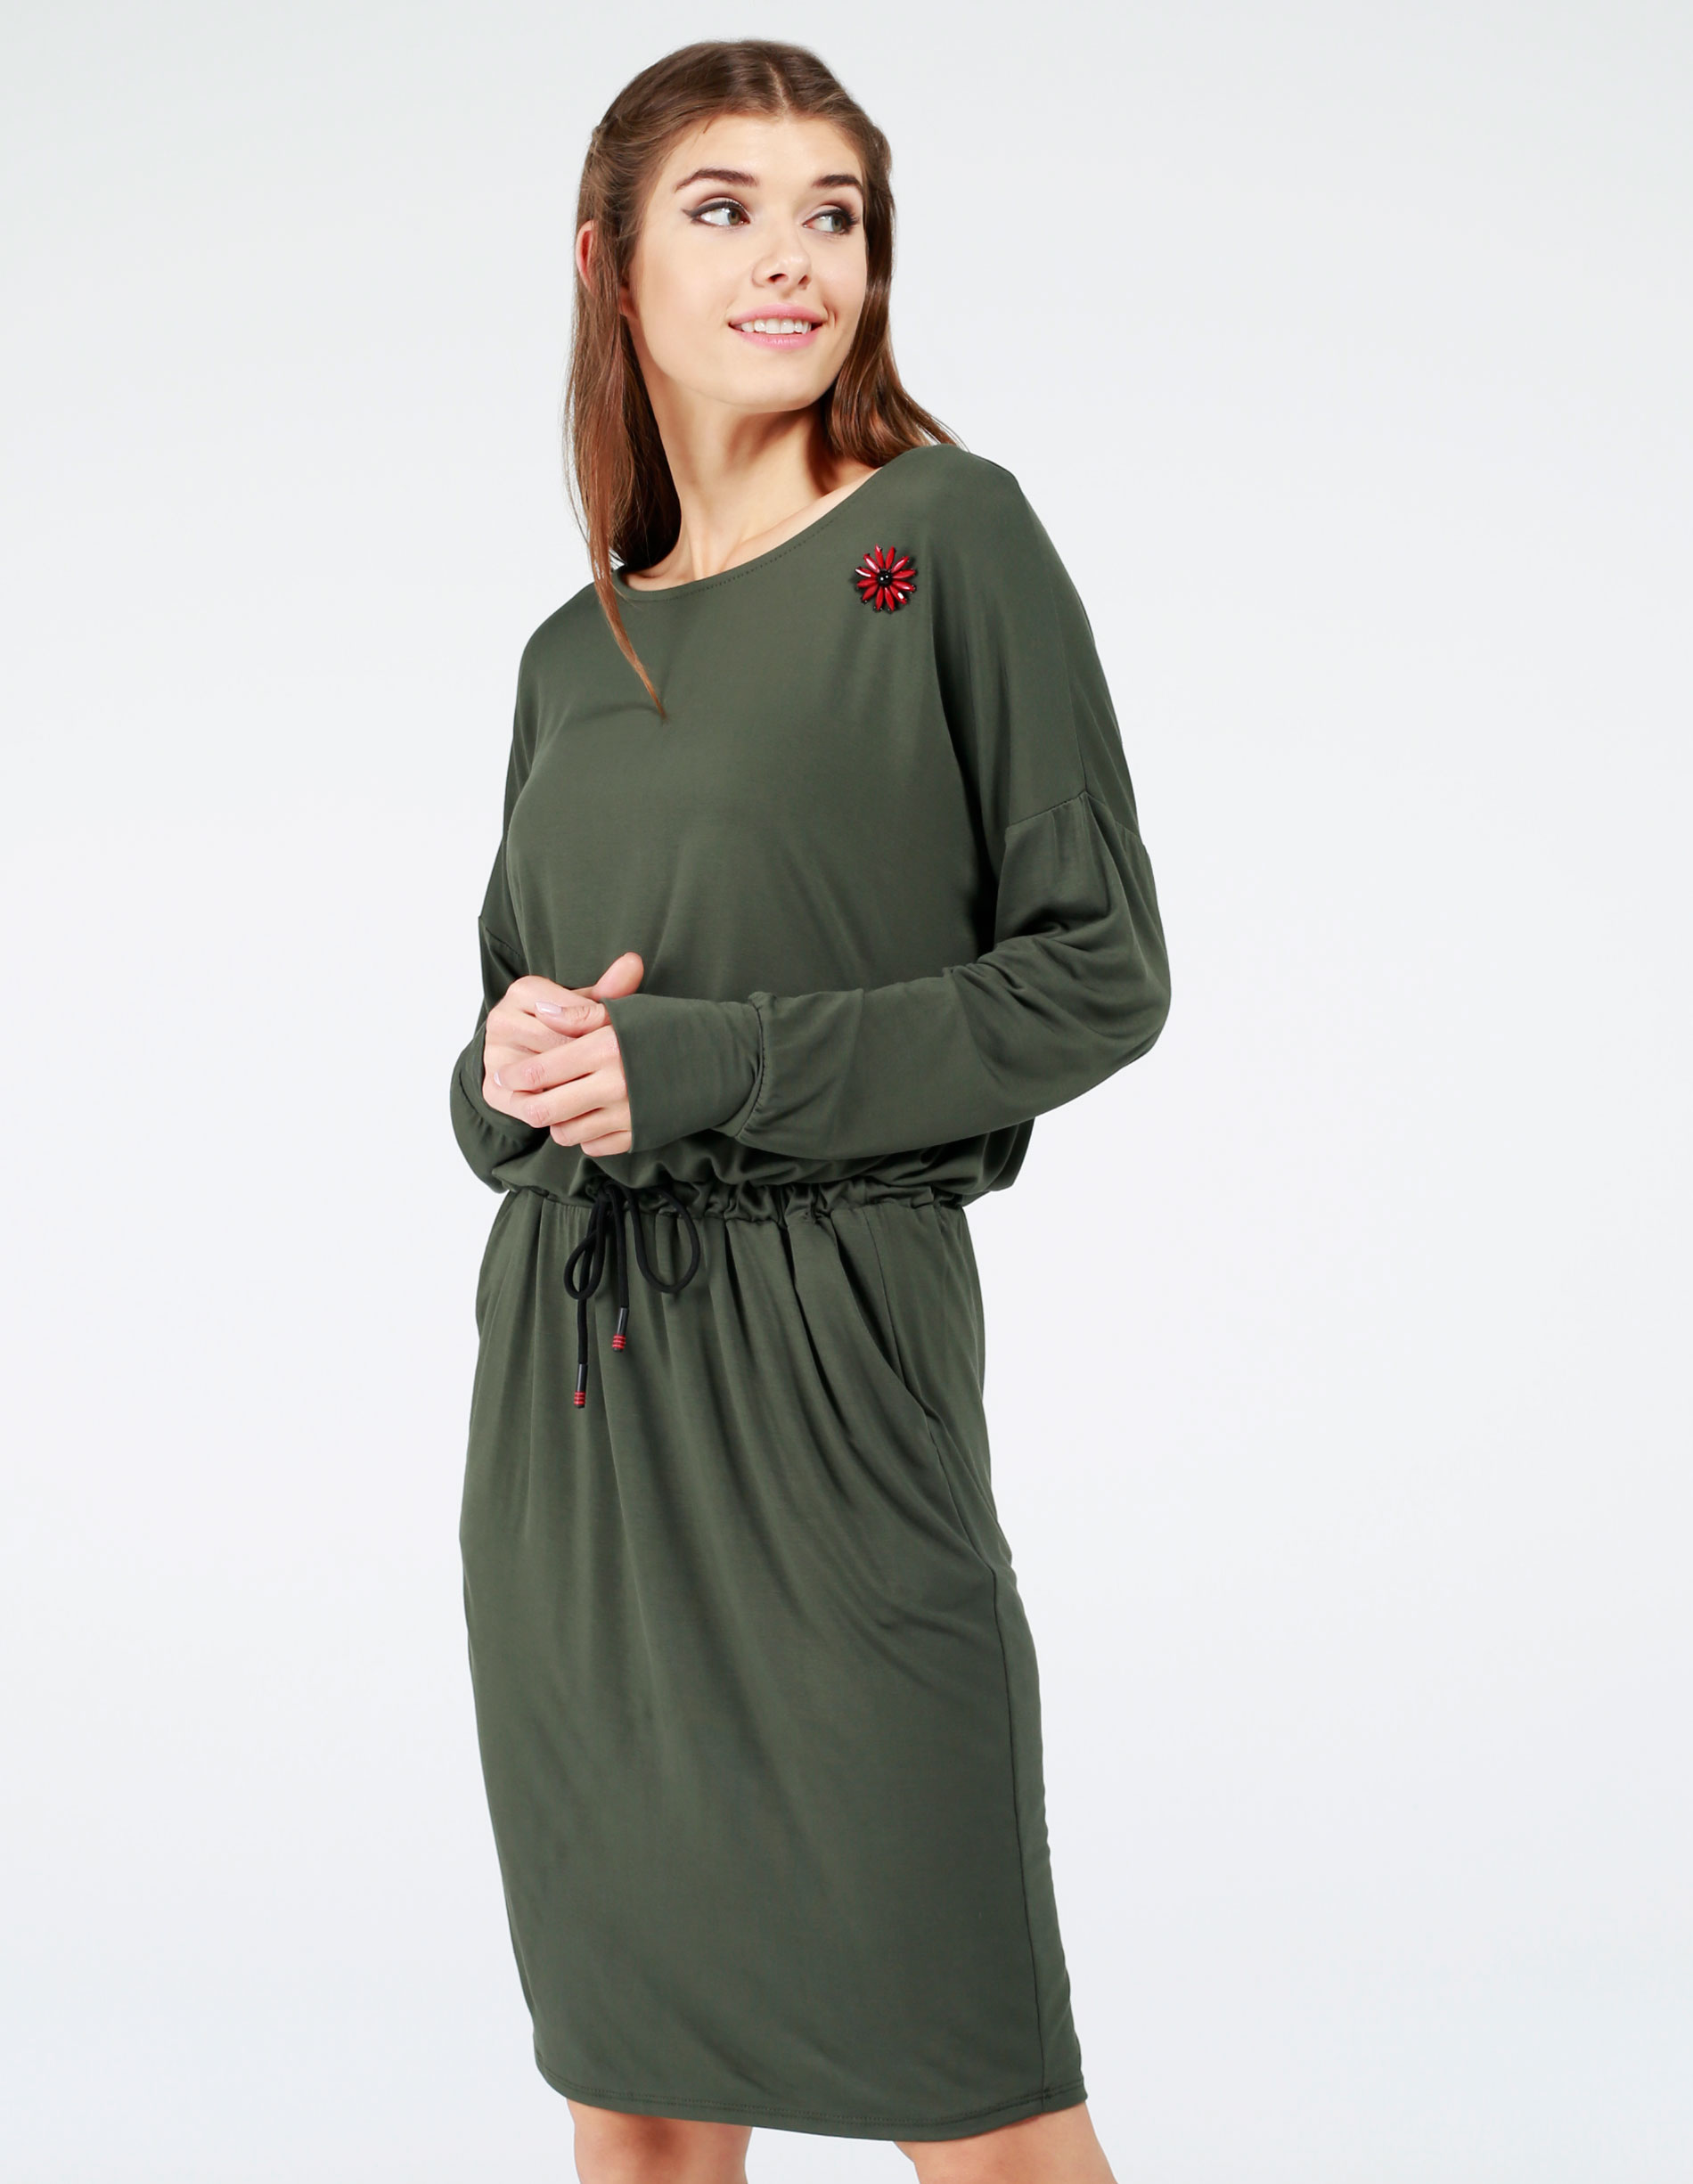 Sukienka - 30-87180 MILI - Unisono